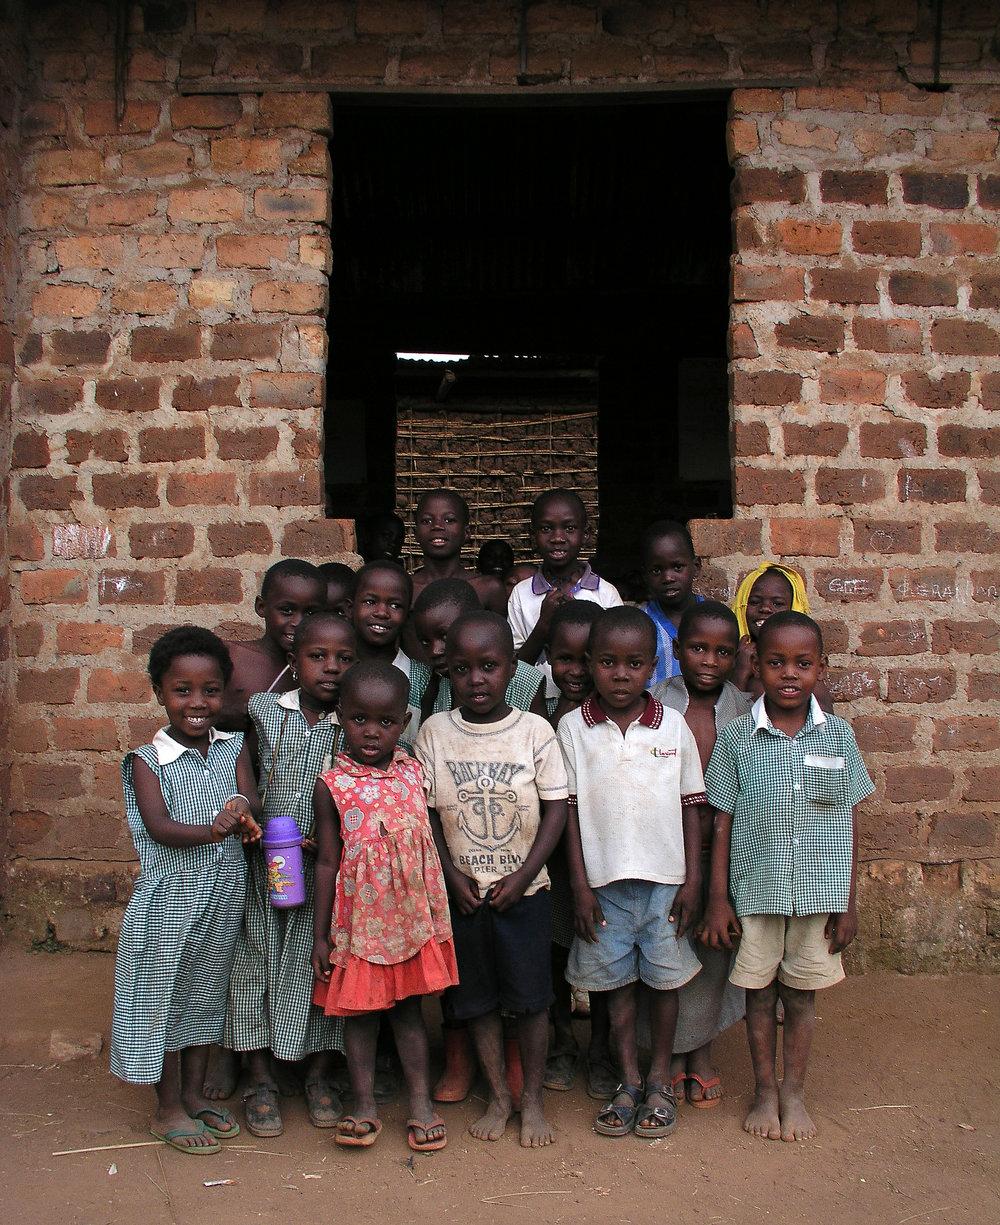 Children in at a school in Kampala, Uganda.    Source   : Arne Hoel / World Bank via Flickr